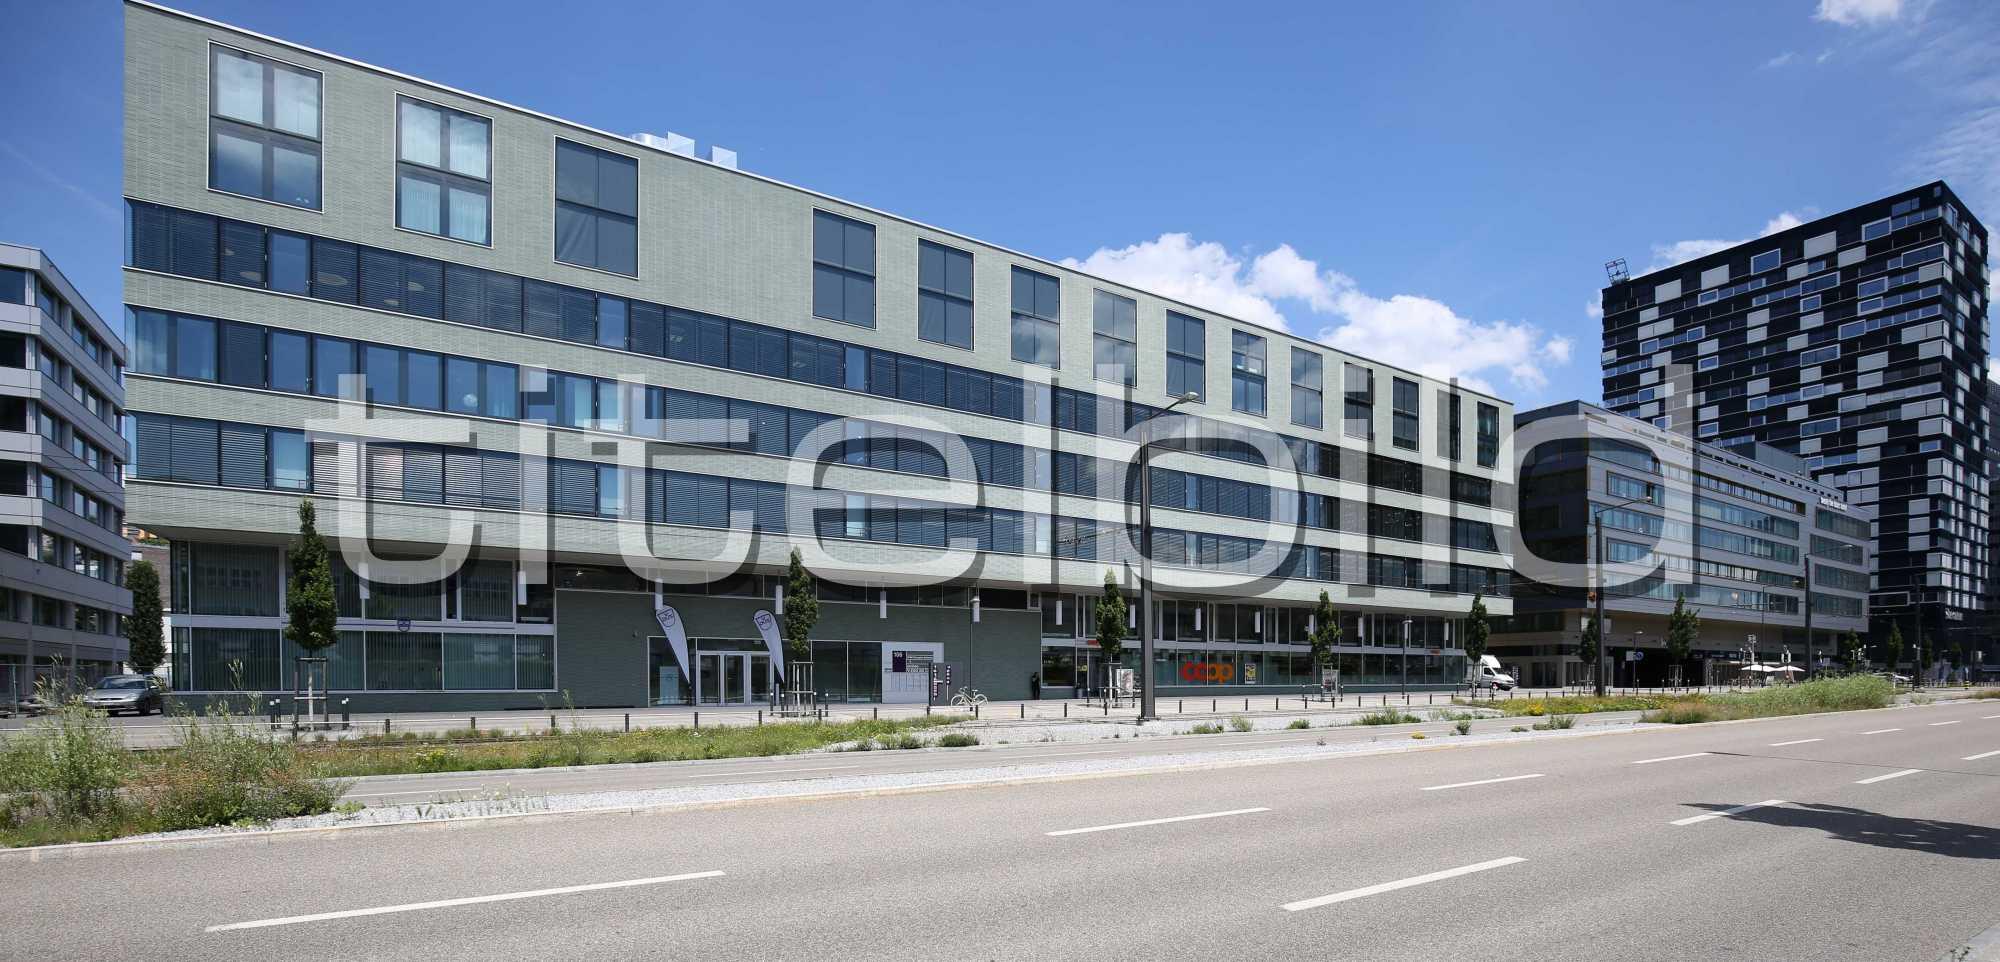 Projektbild-Nr. 2: HardturmPark Baufeld A2 Mietwohnungen